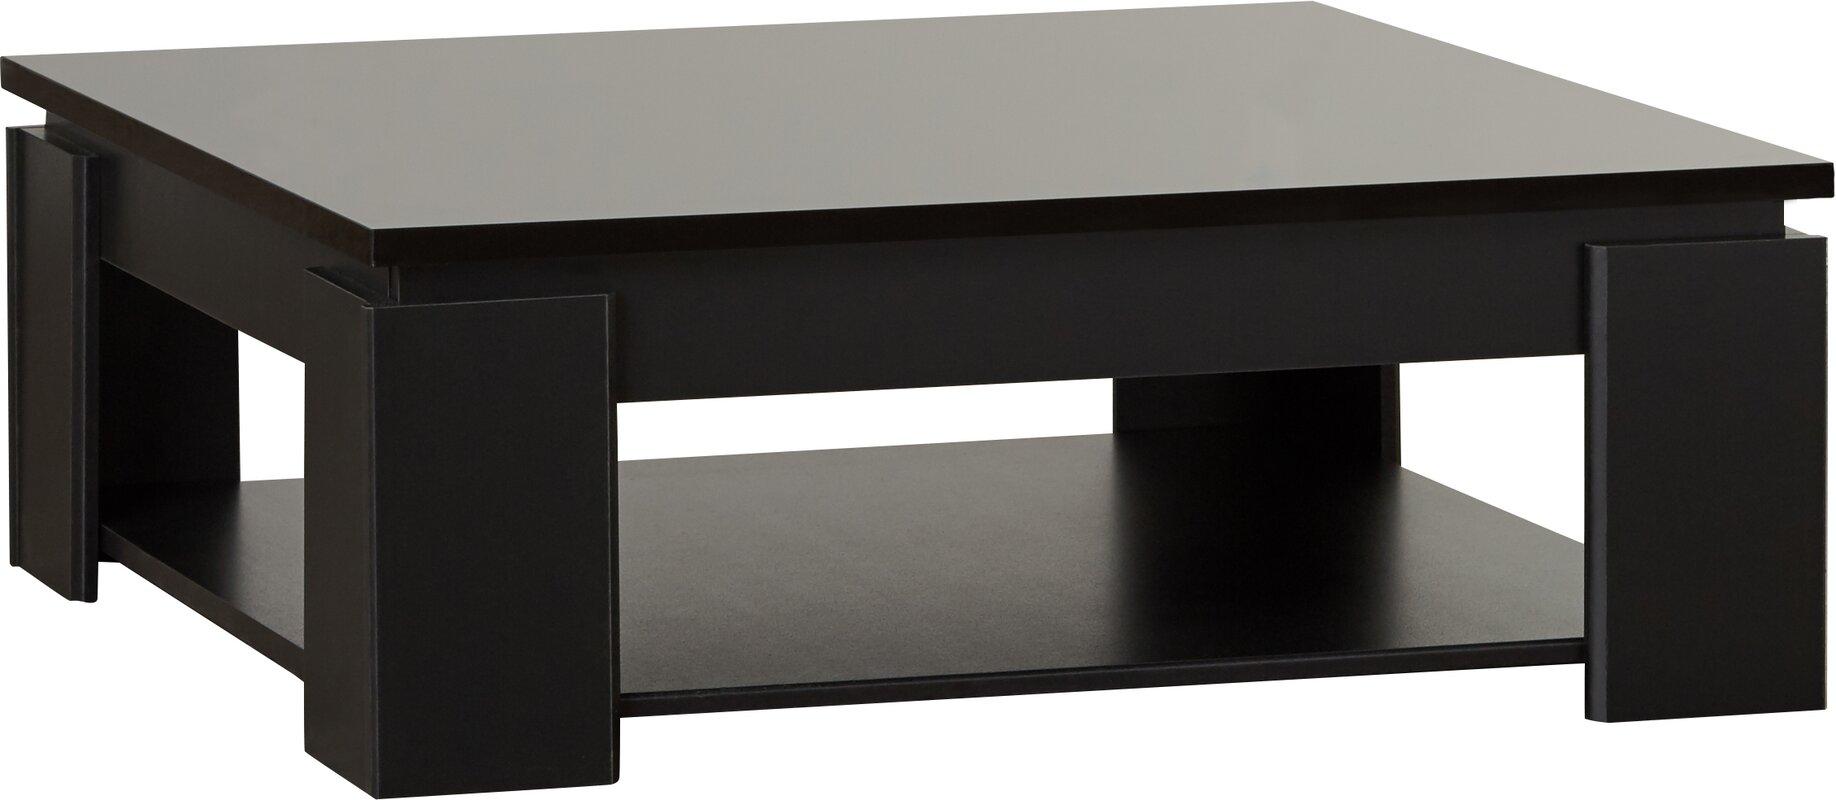 Fabrizio Coffee Table With Storage